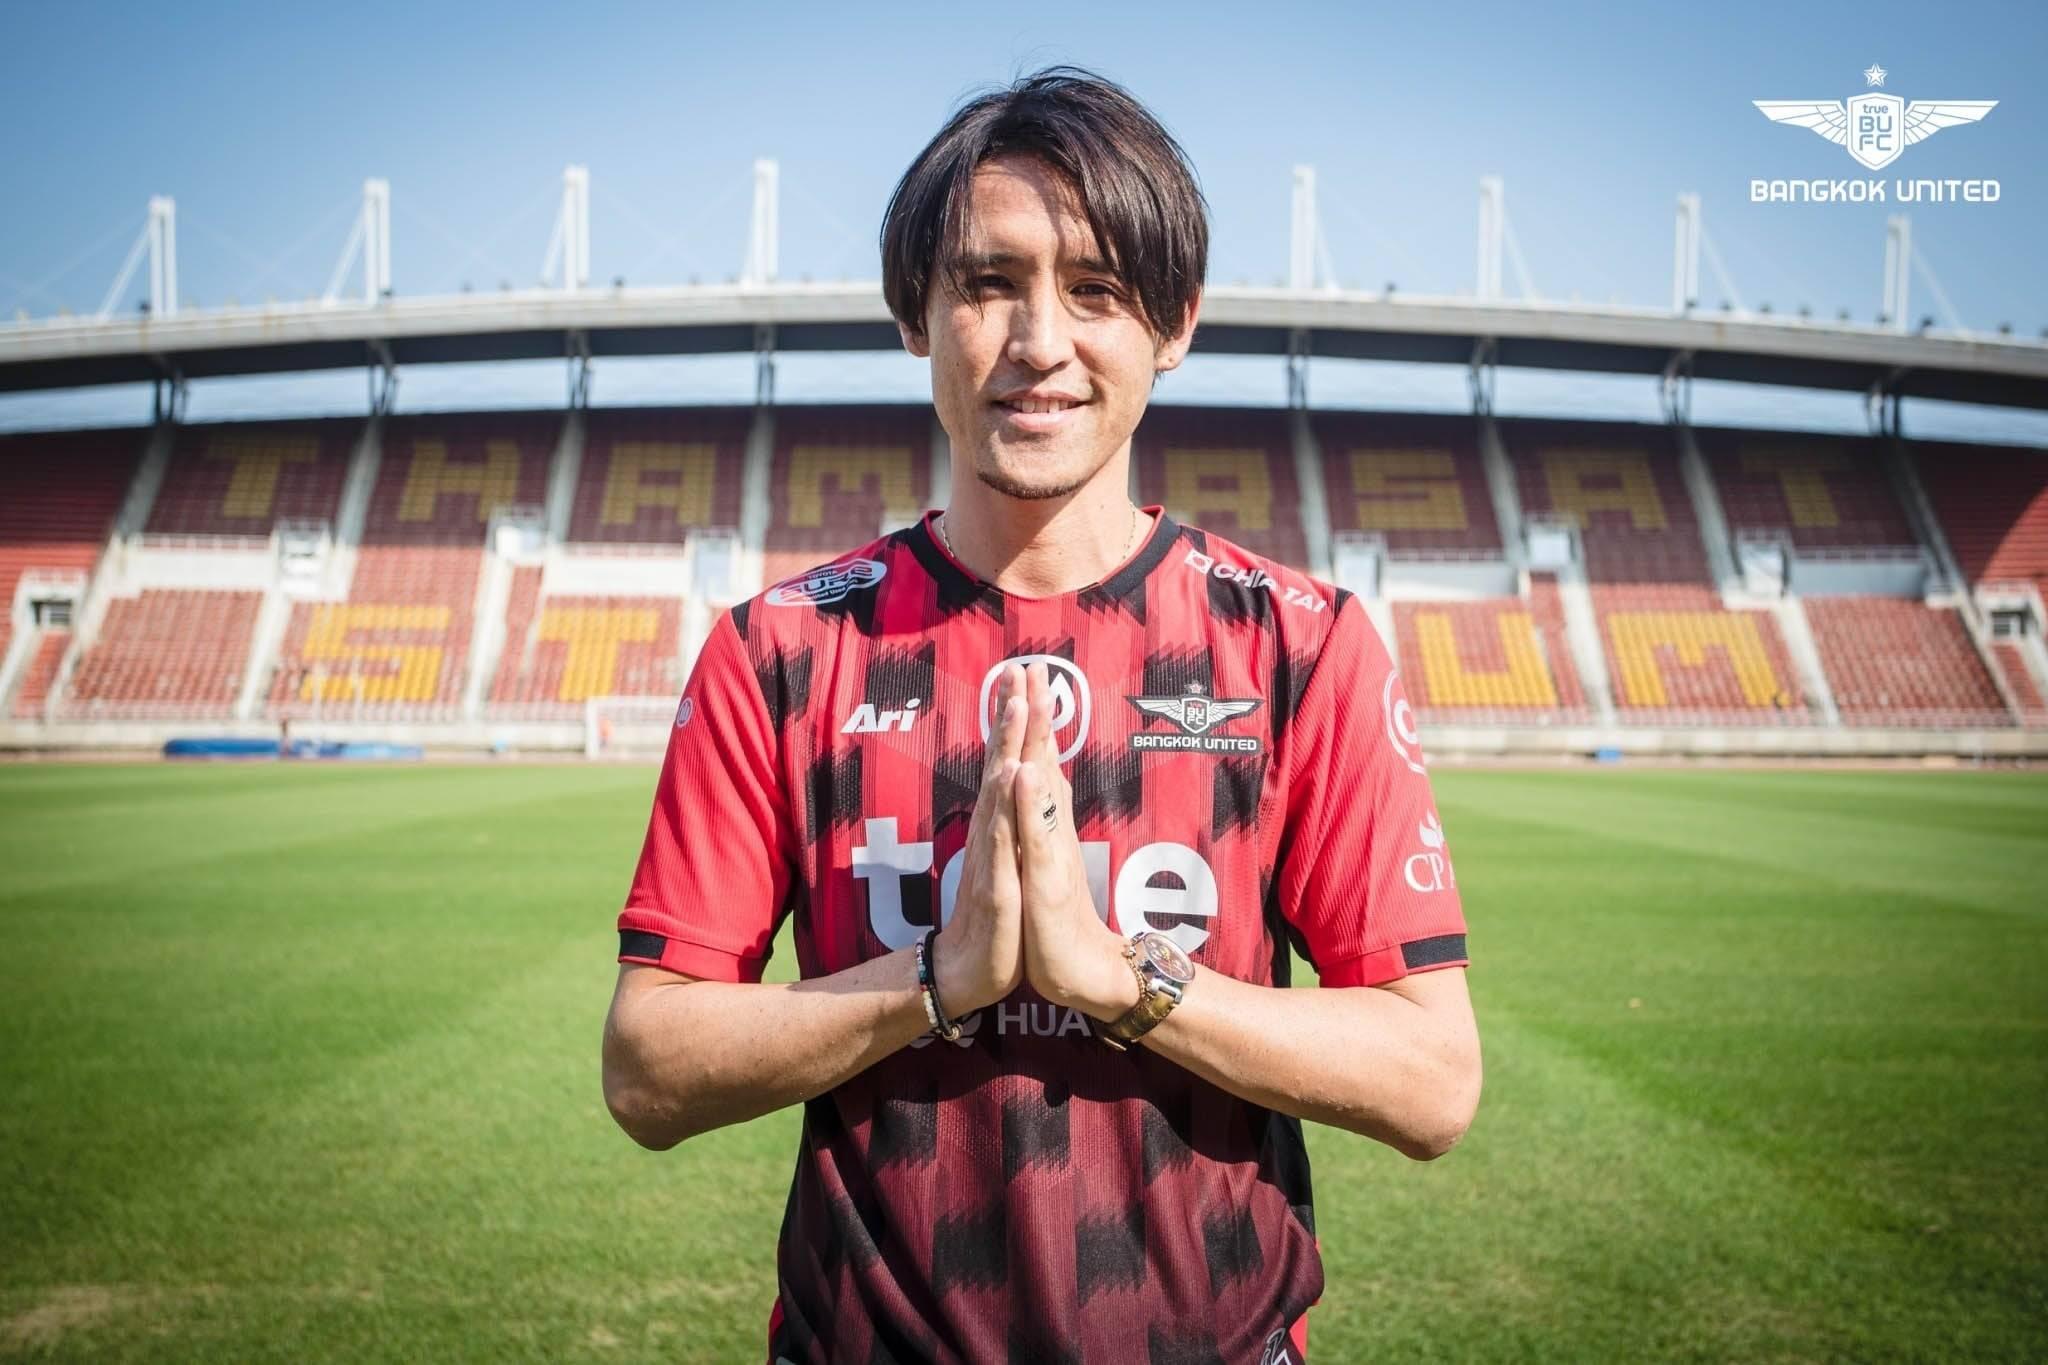 Former Japan International Hajime Hosogai Joins Bangkok United